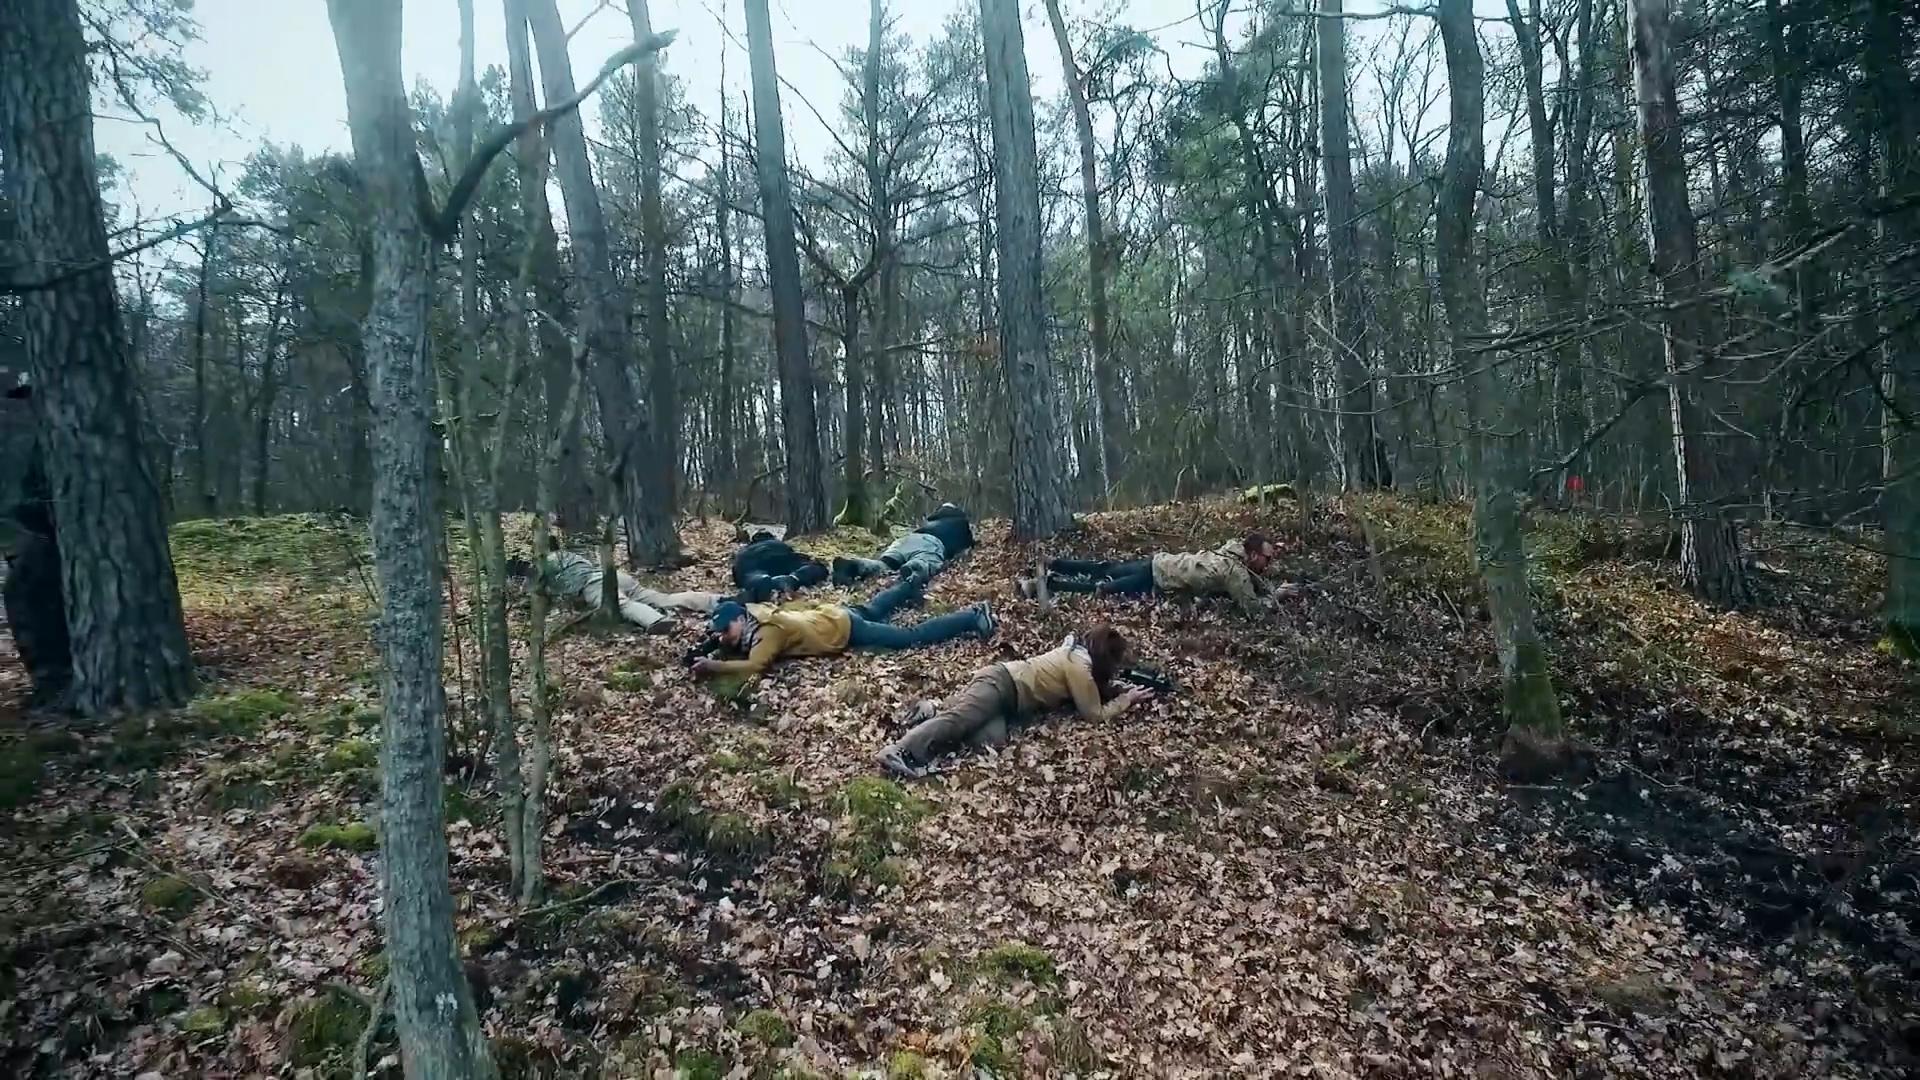 Latanie dronem w lesie